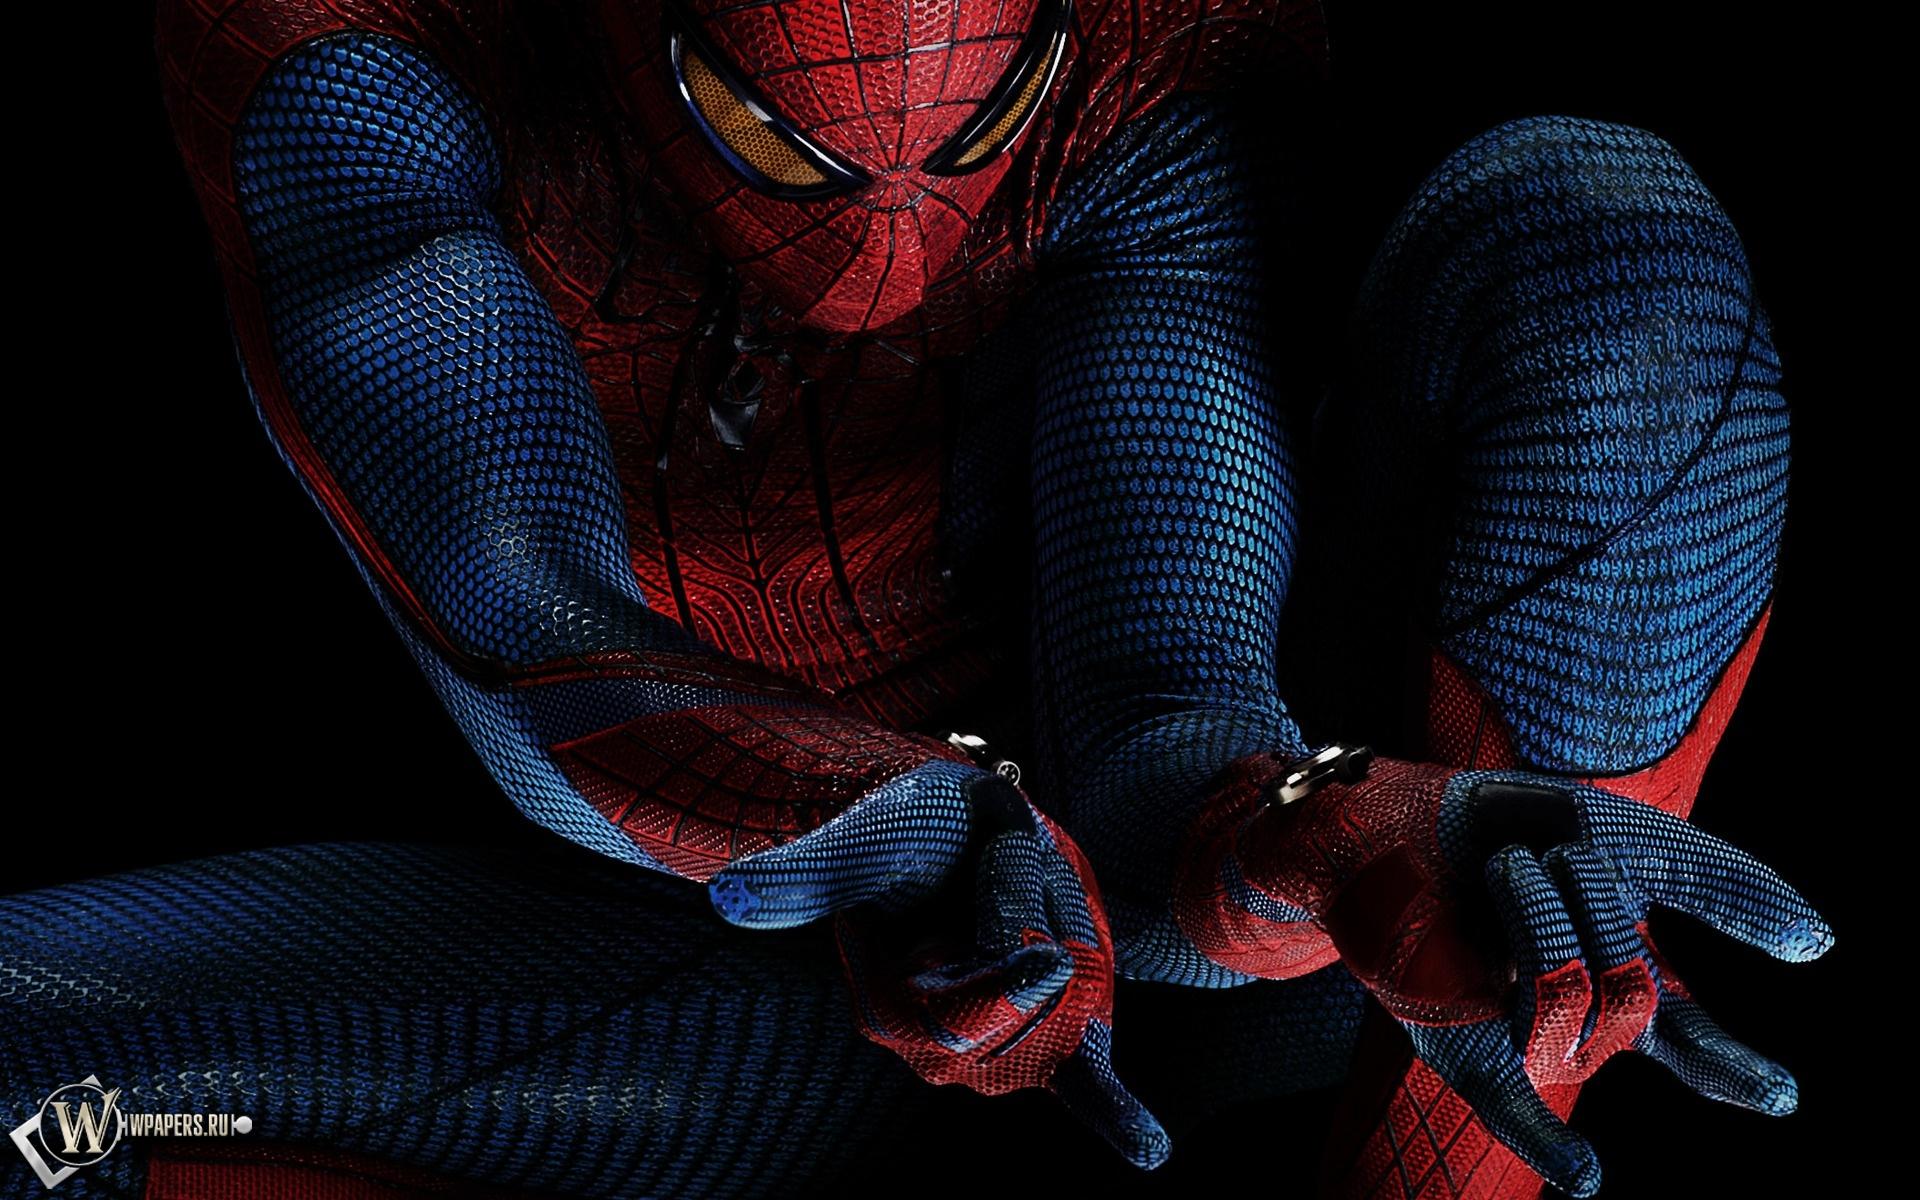 Обои человек паук 3 человек паук